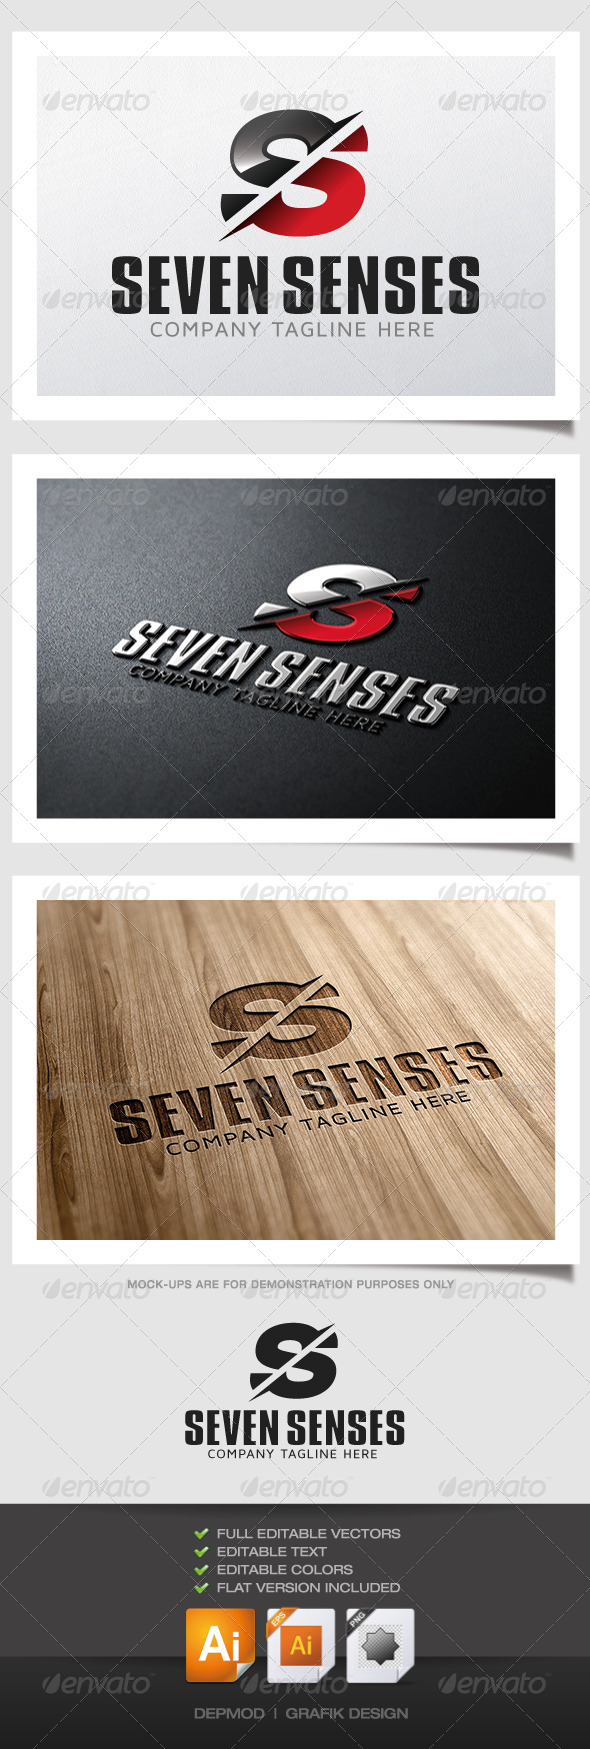 GraphicRiver Seven Senses Logo 5009737